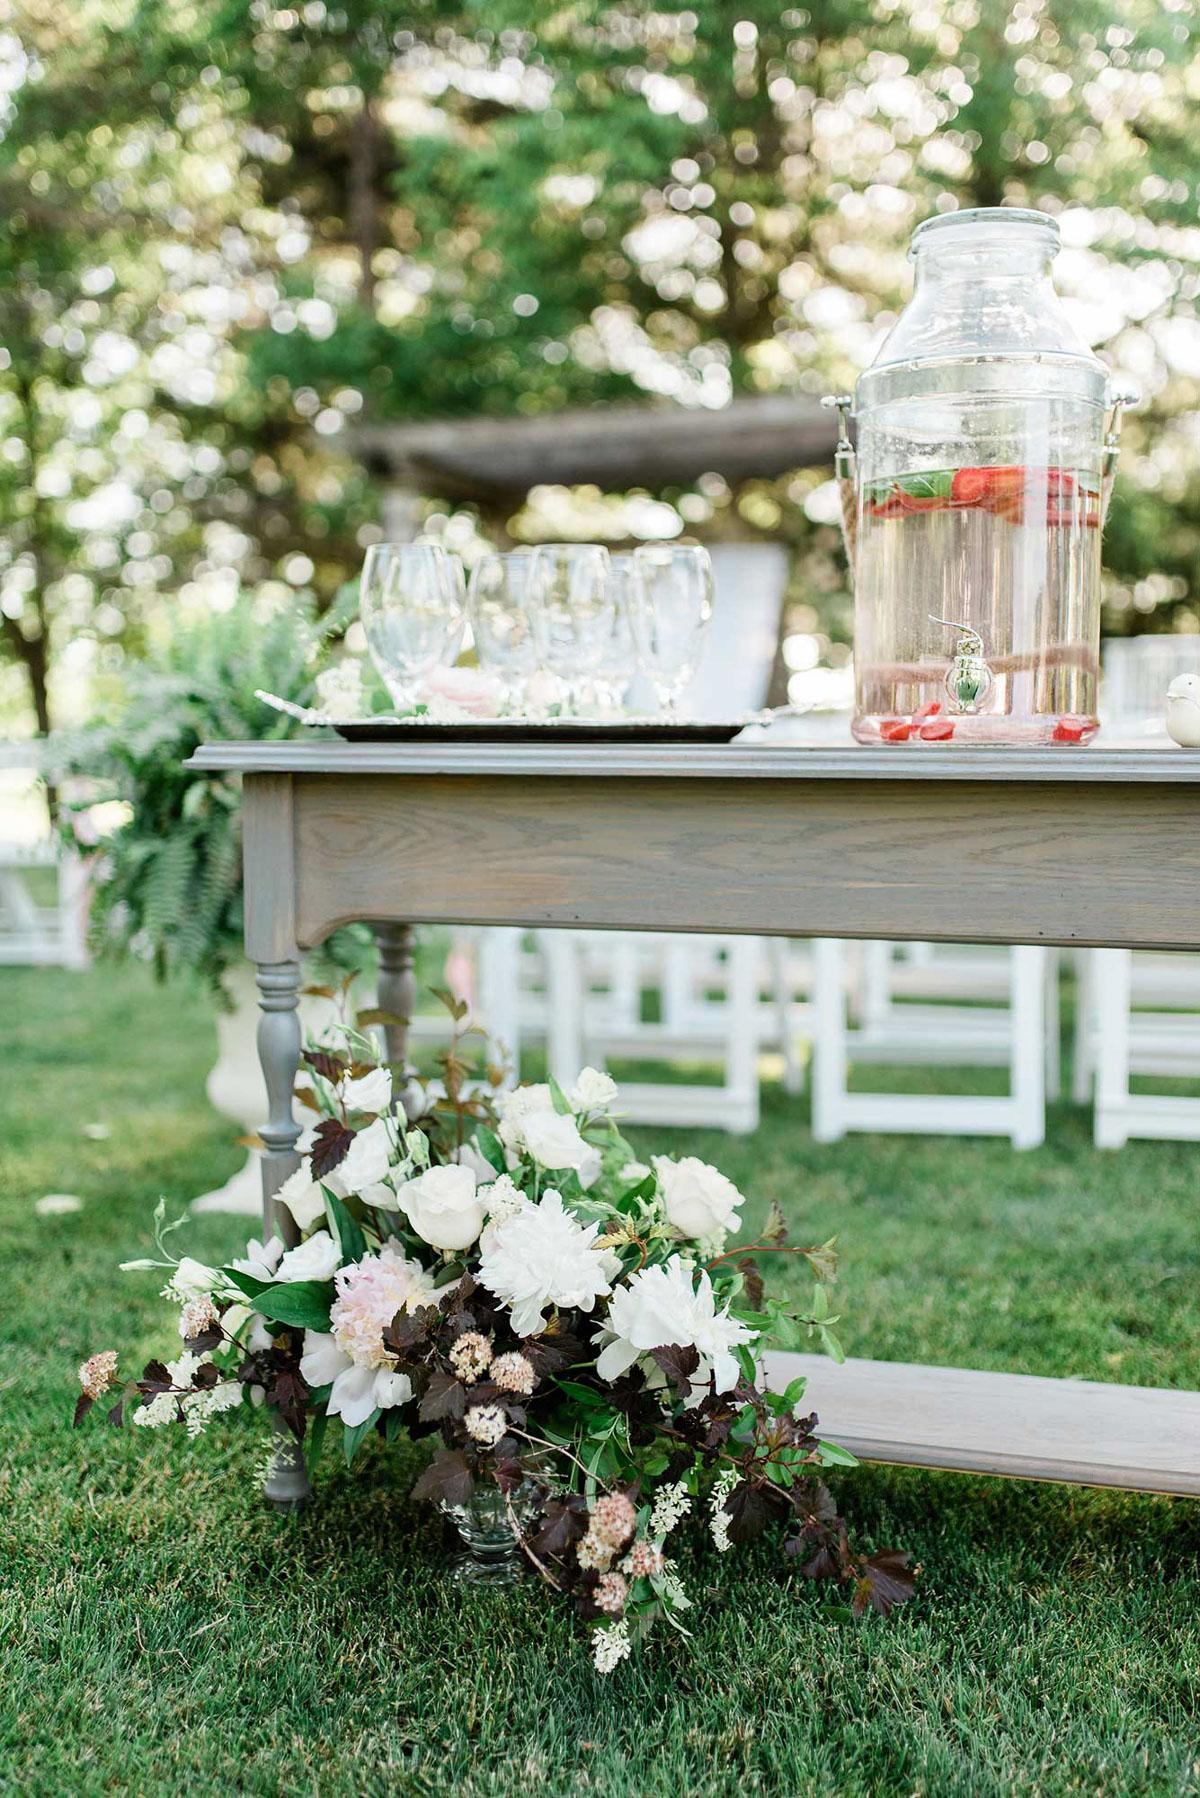 destiny-dawn-photography-vineyard-bride-swish-list-knollwood-golf-and-country-club-ancaster-wedding-editorial-10.jpg